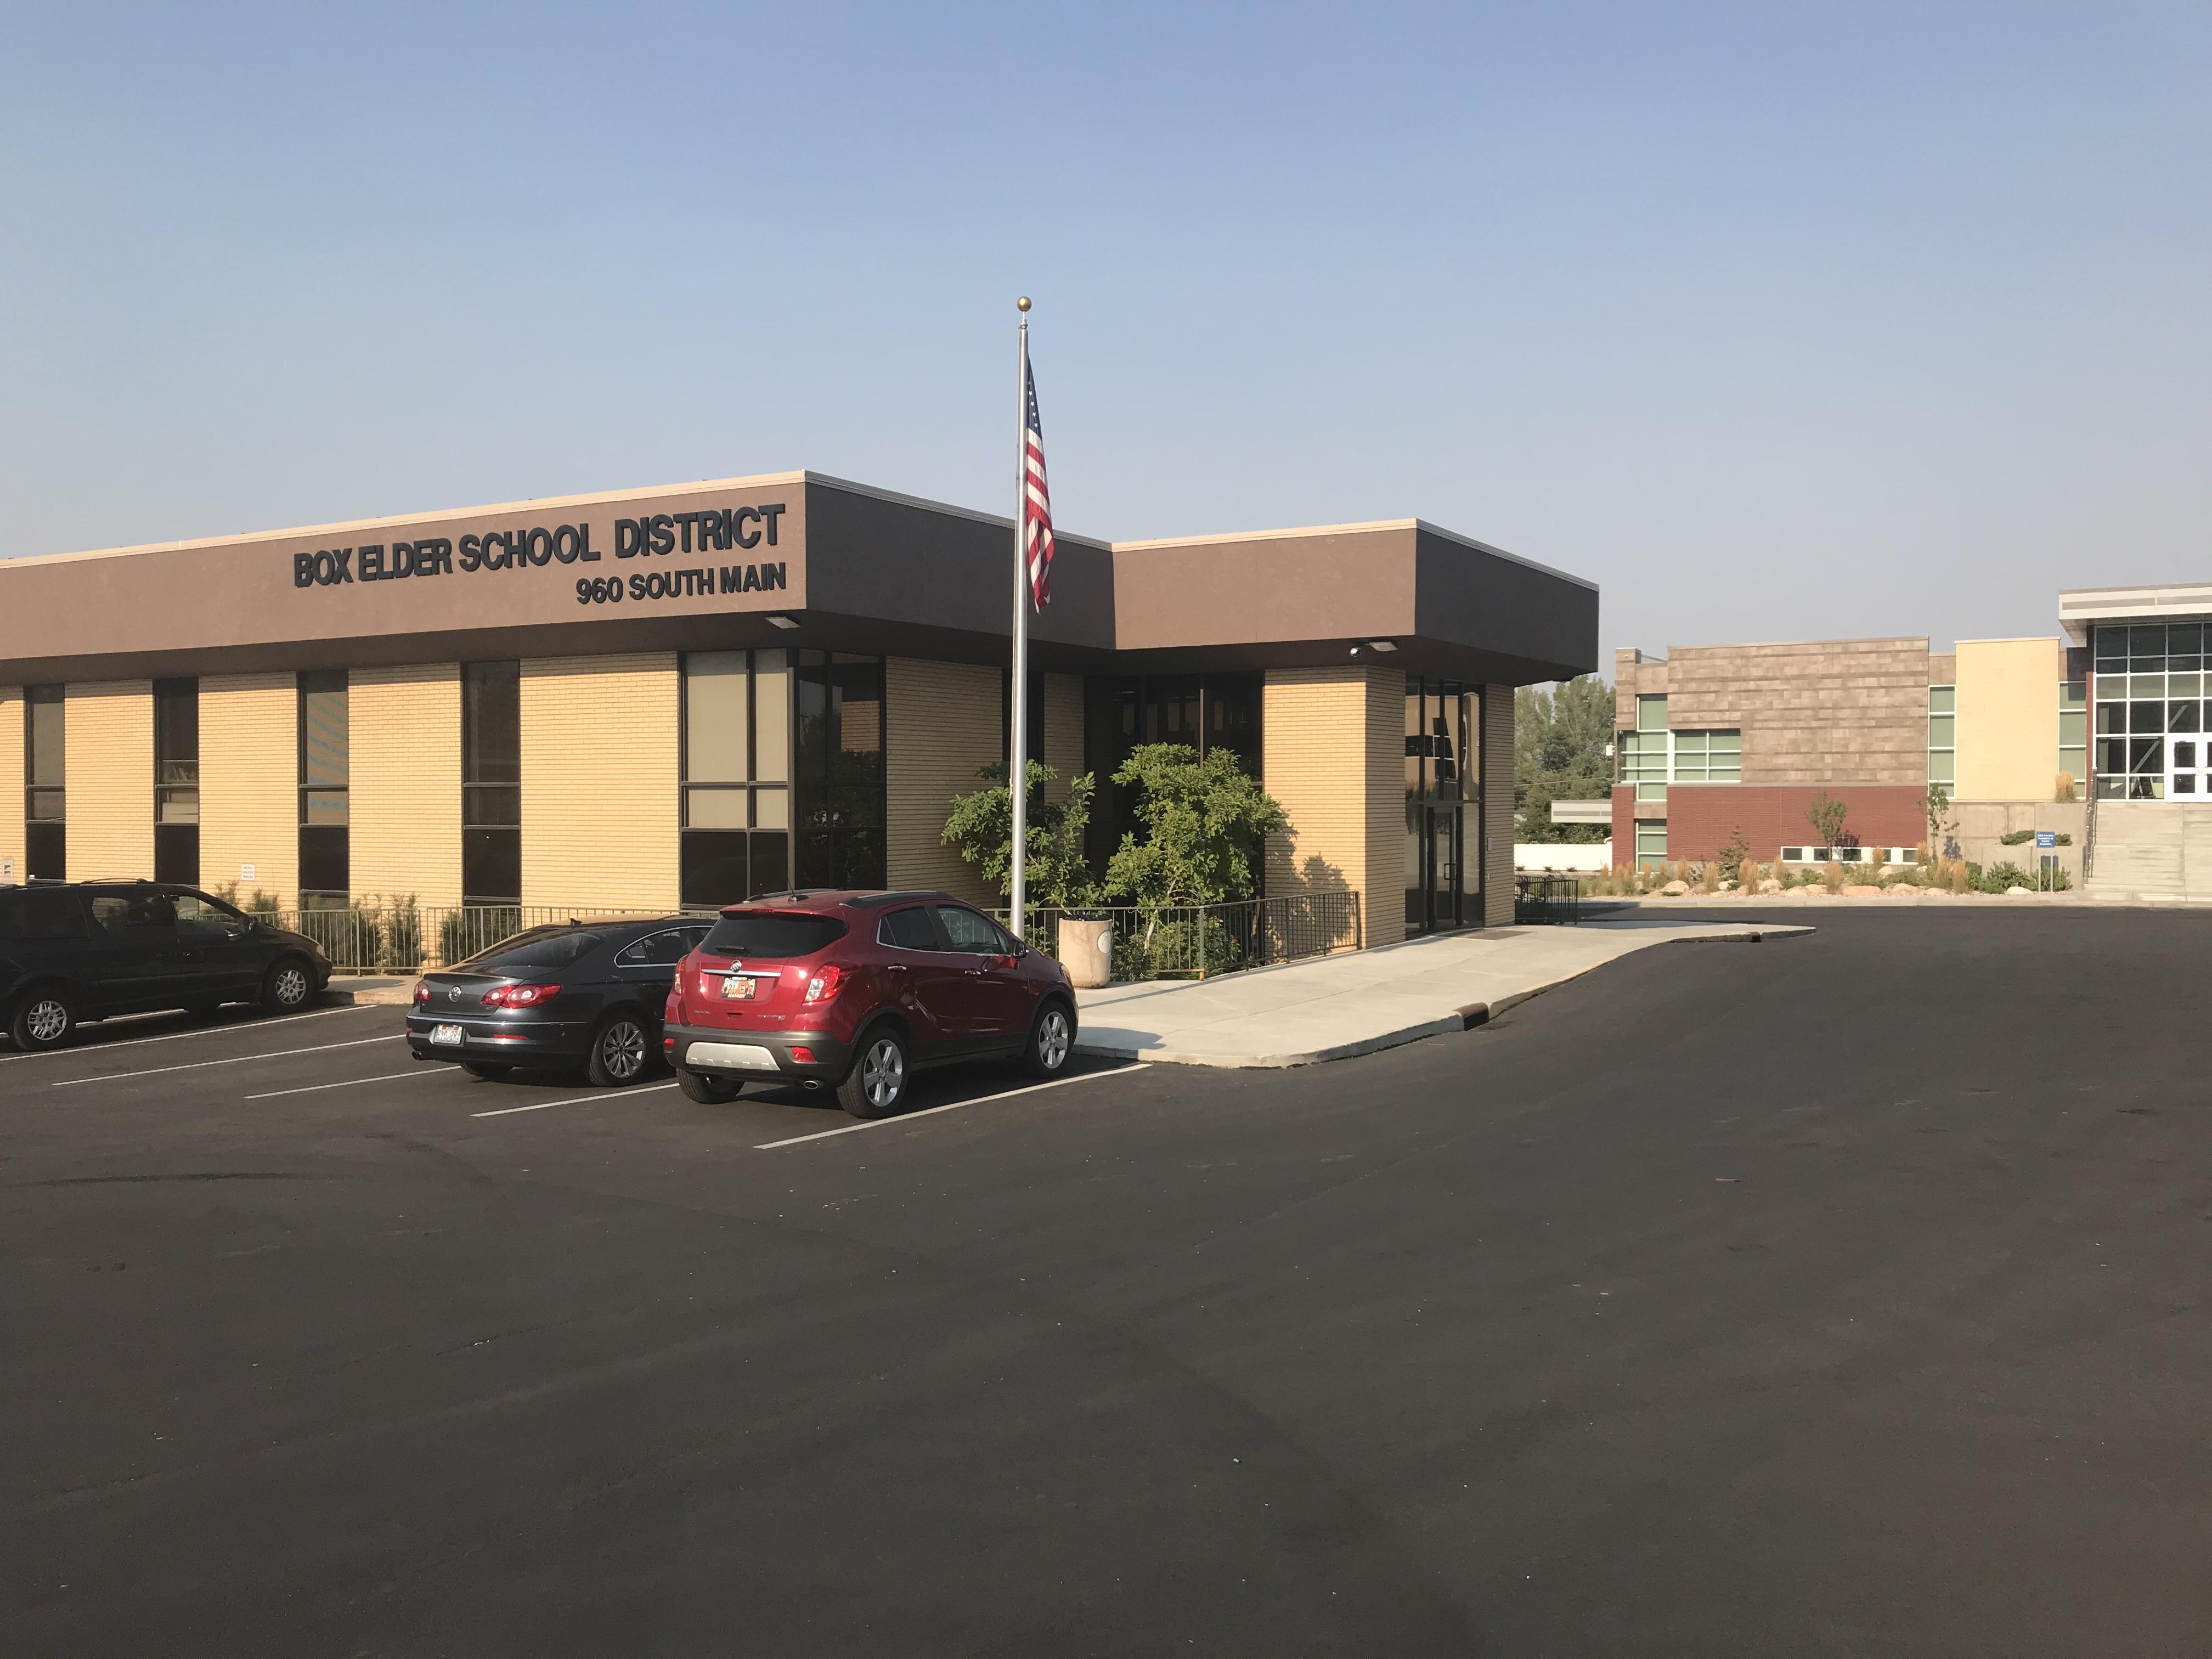 Box Elder School District Office